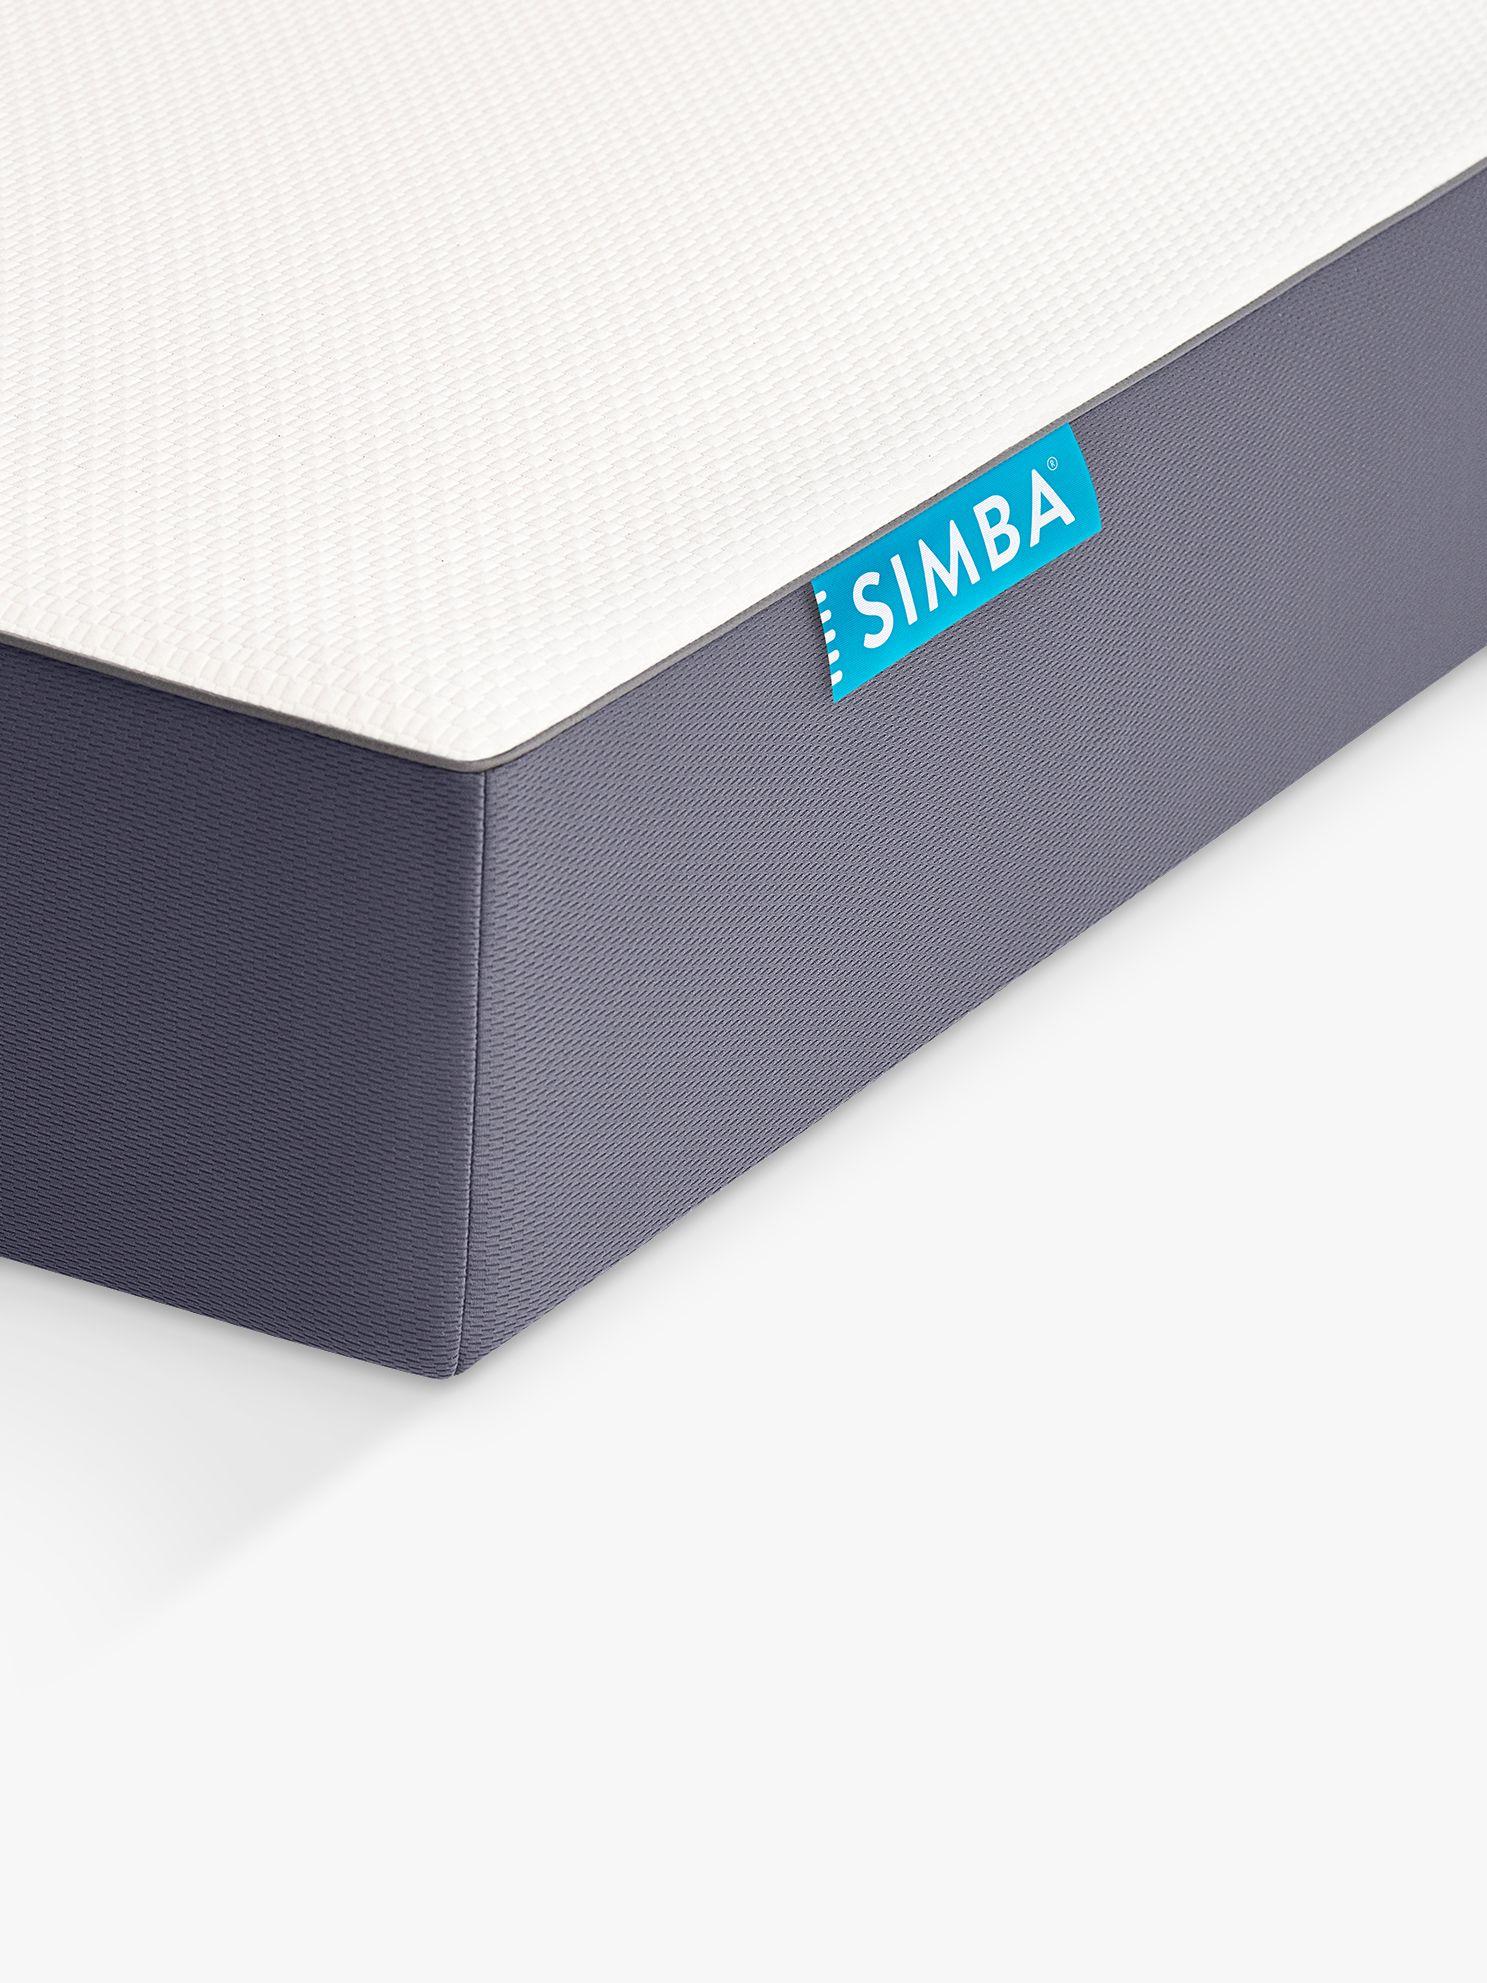 Simba SIMBA Hybrid Memory Foam Pocket Spring Mattress, Small Double